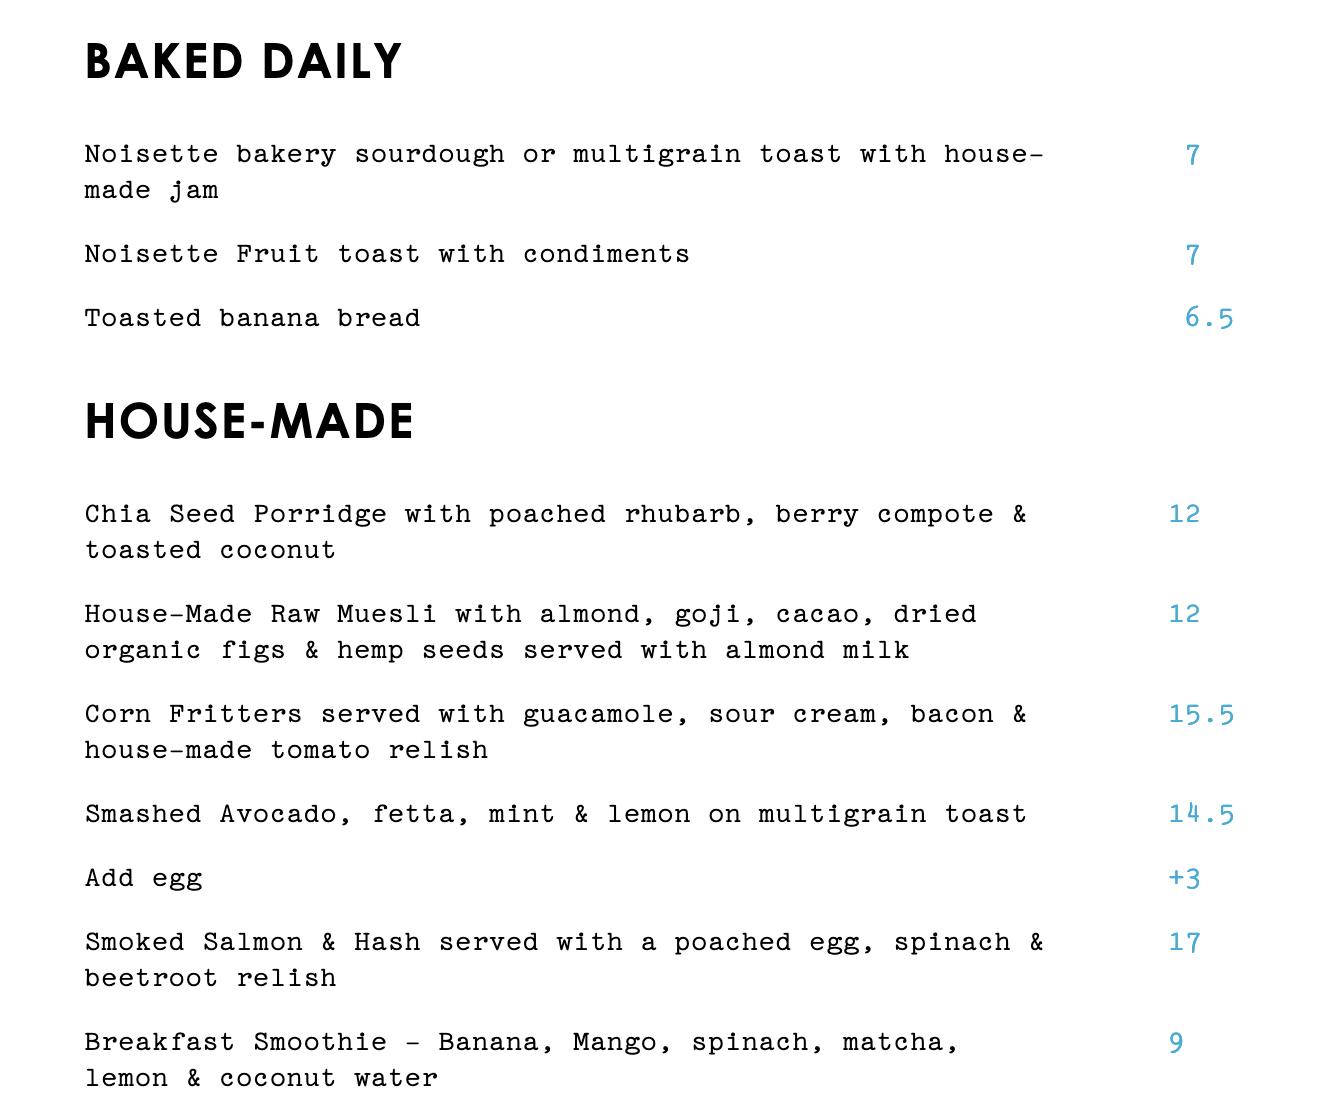 Trunk diner menu #1